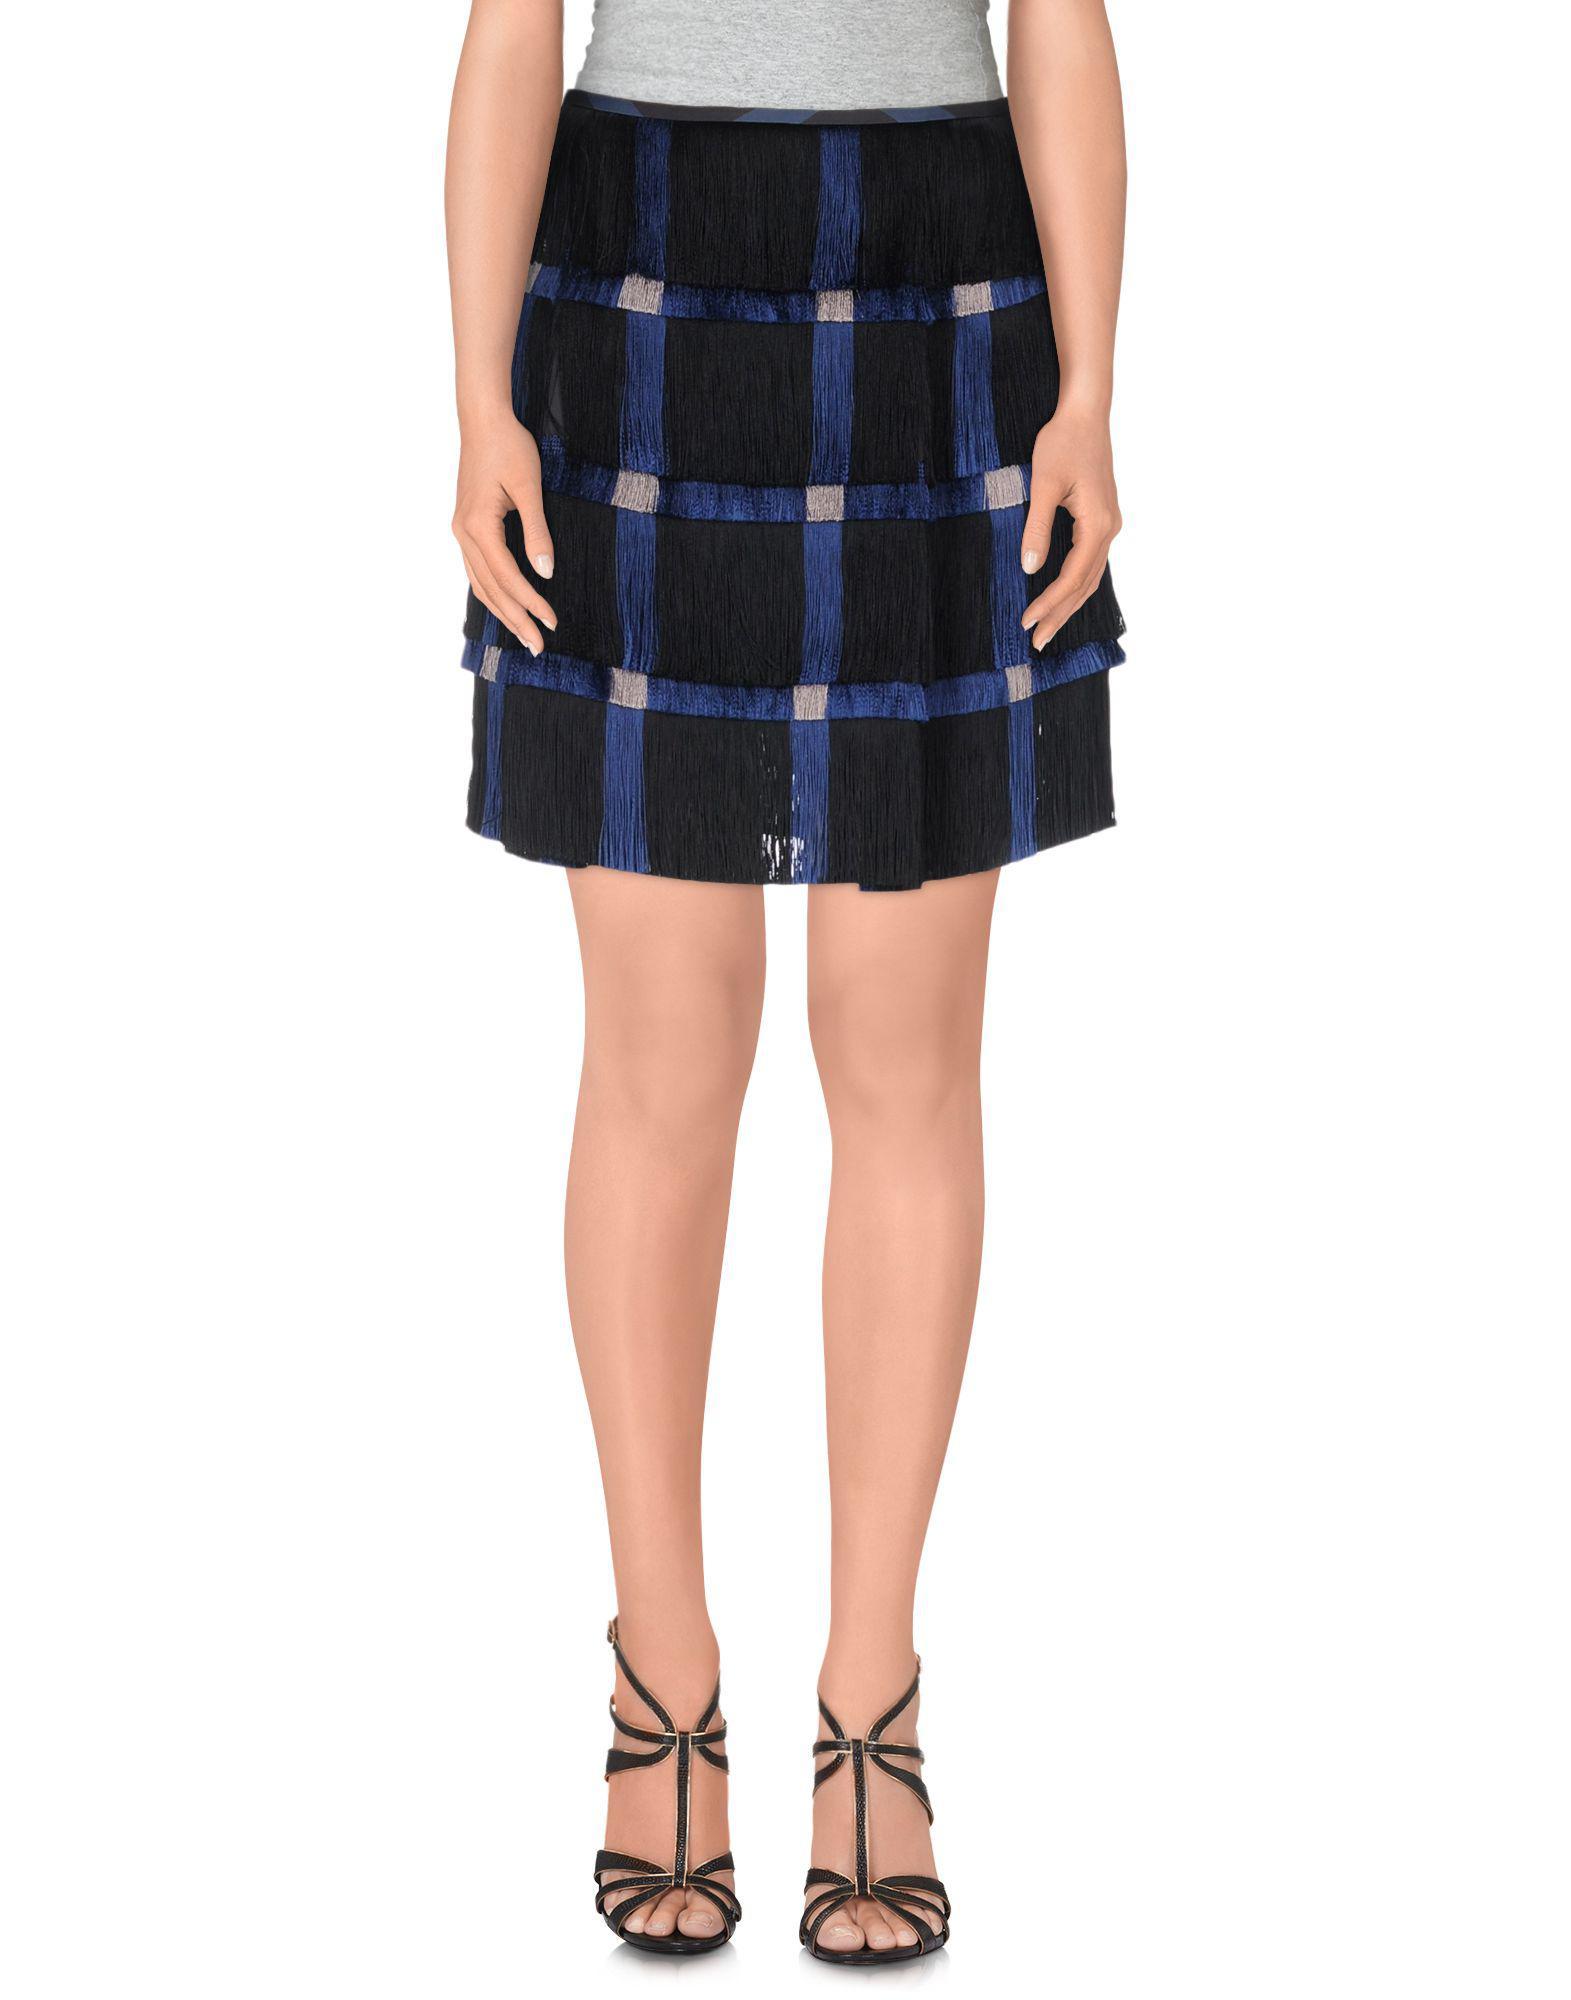 Lyst - Marco De Vincenzo Mini Skirt in Blue